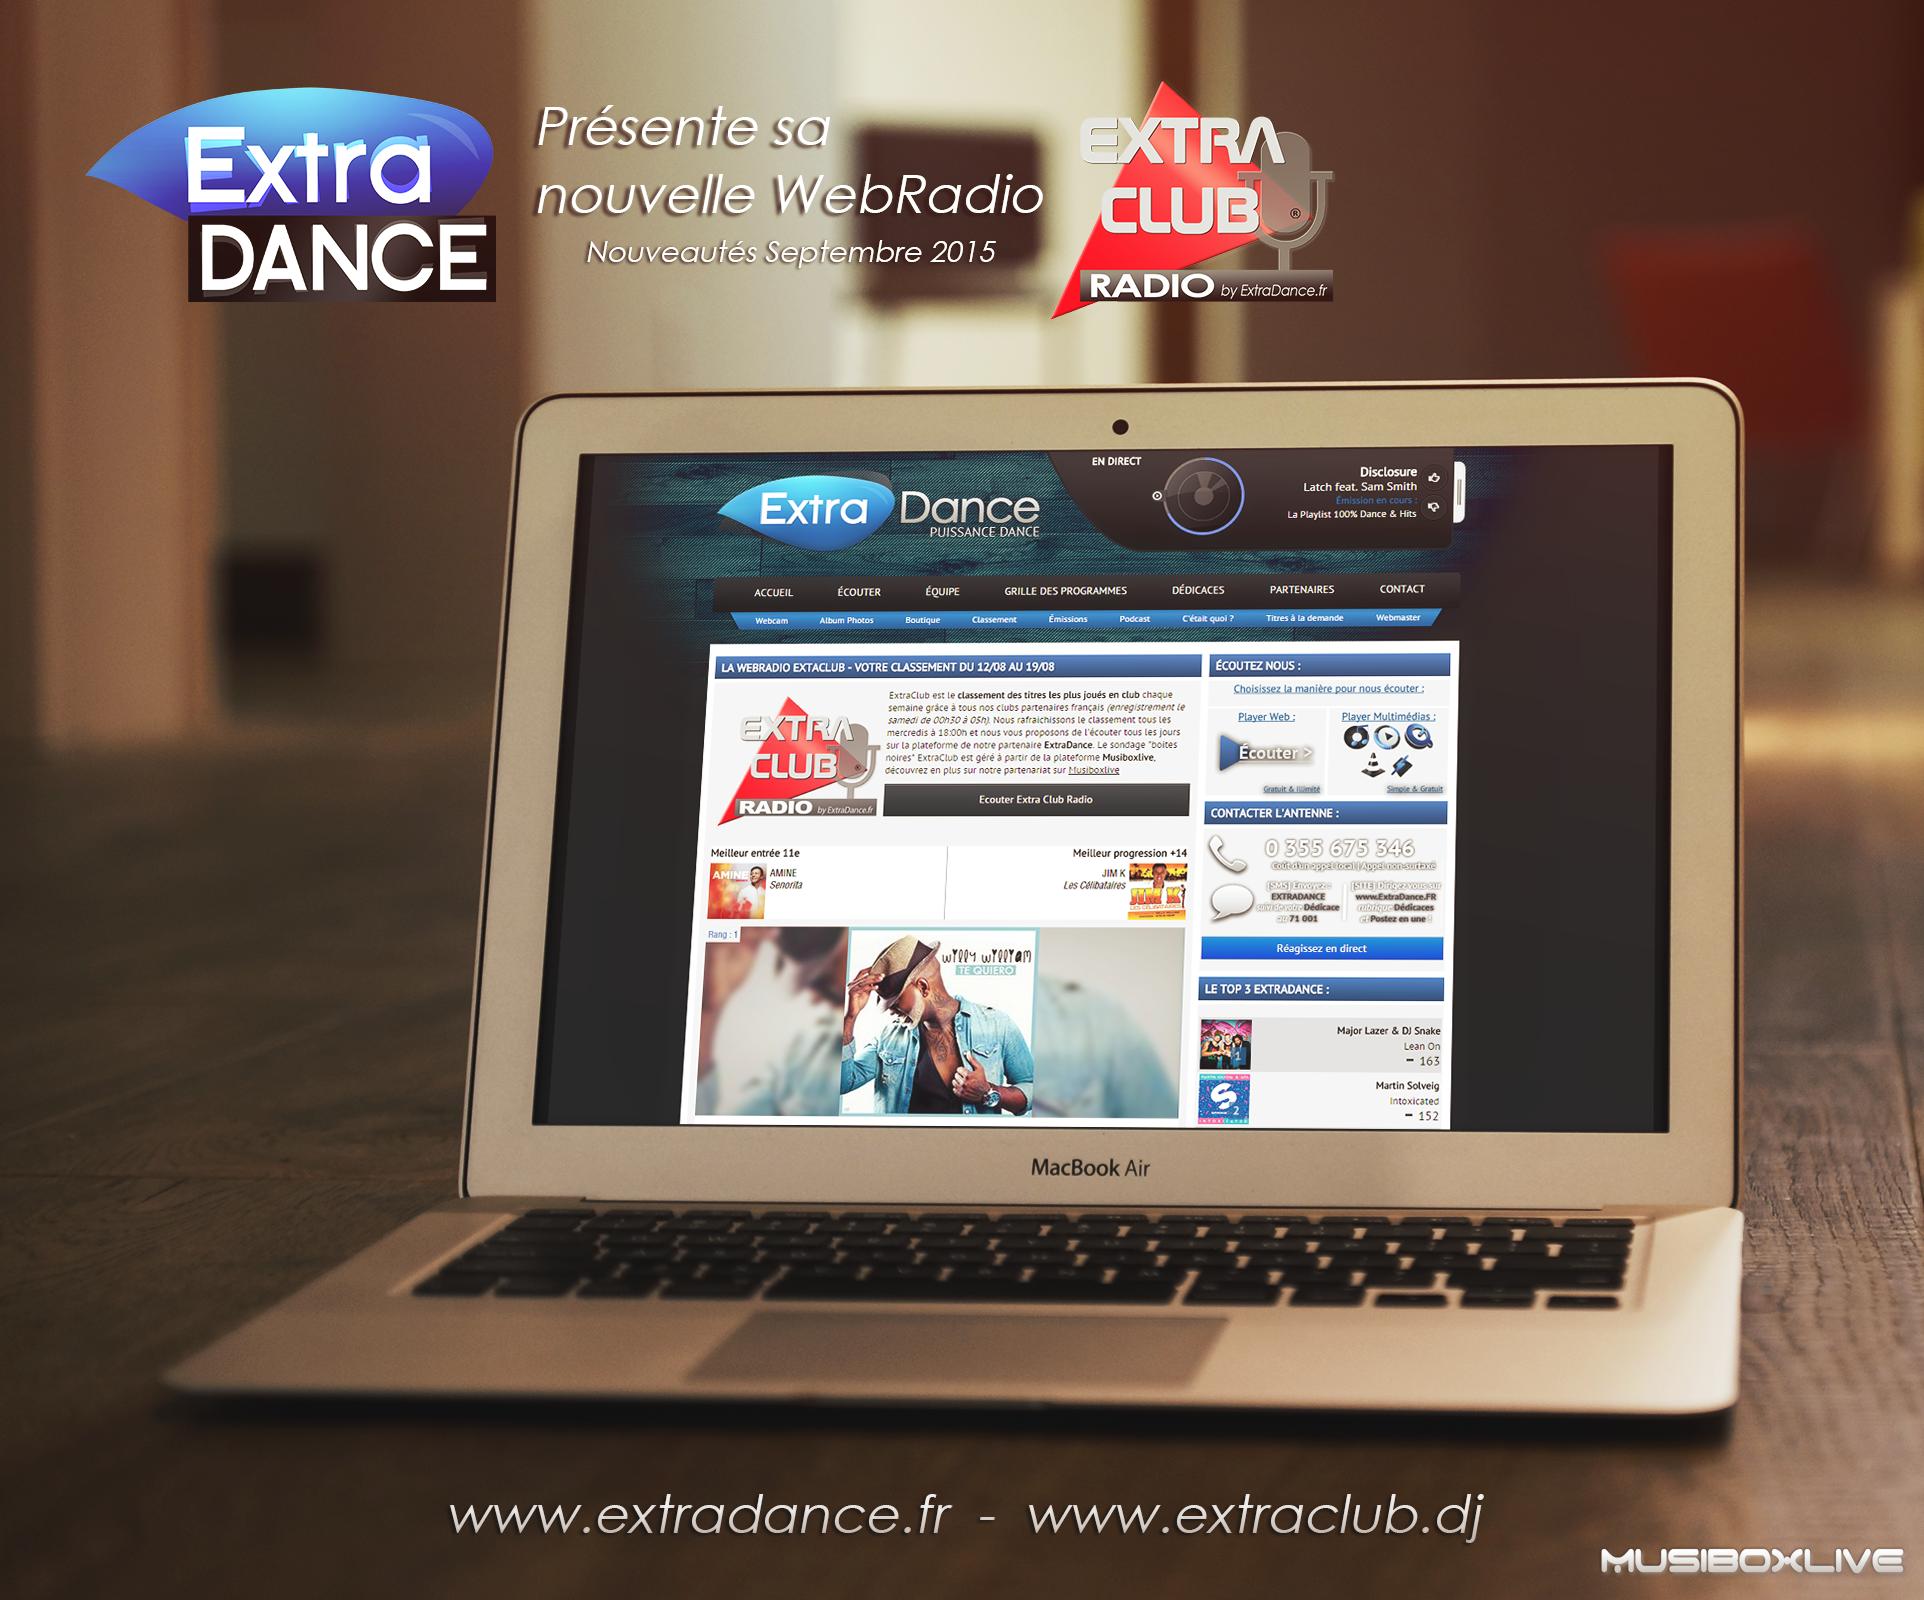 La webradio Extradance lance ExtraClub